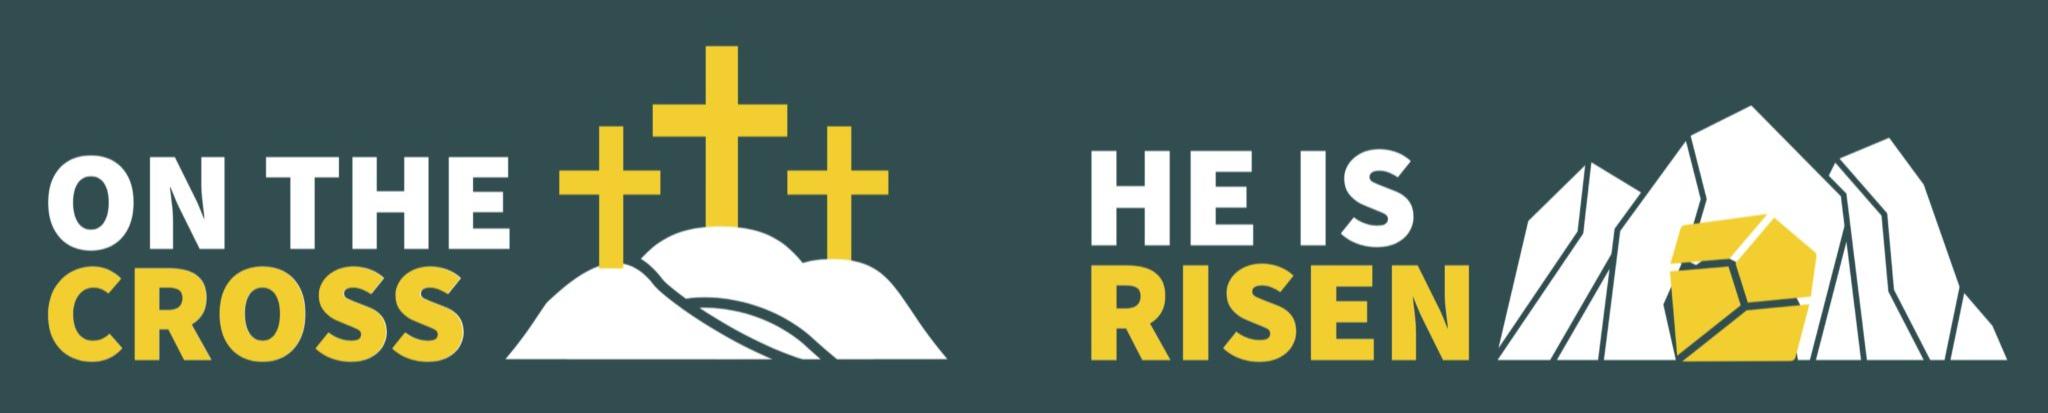 On The Cross & He Is Risen